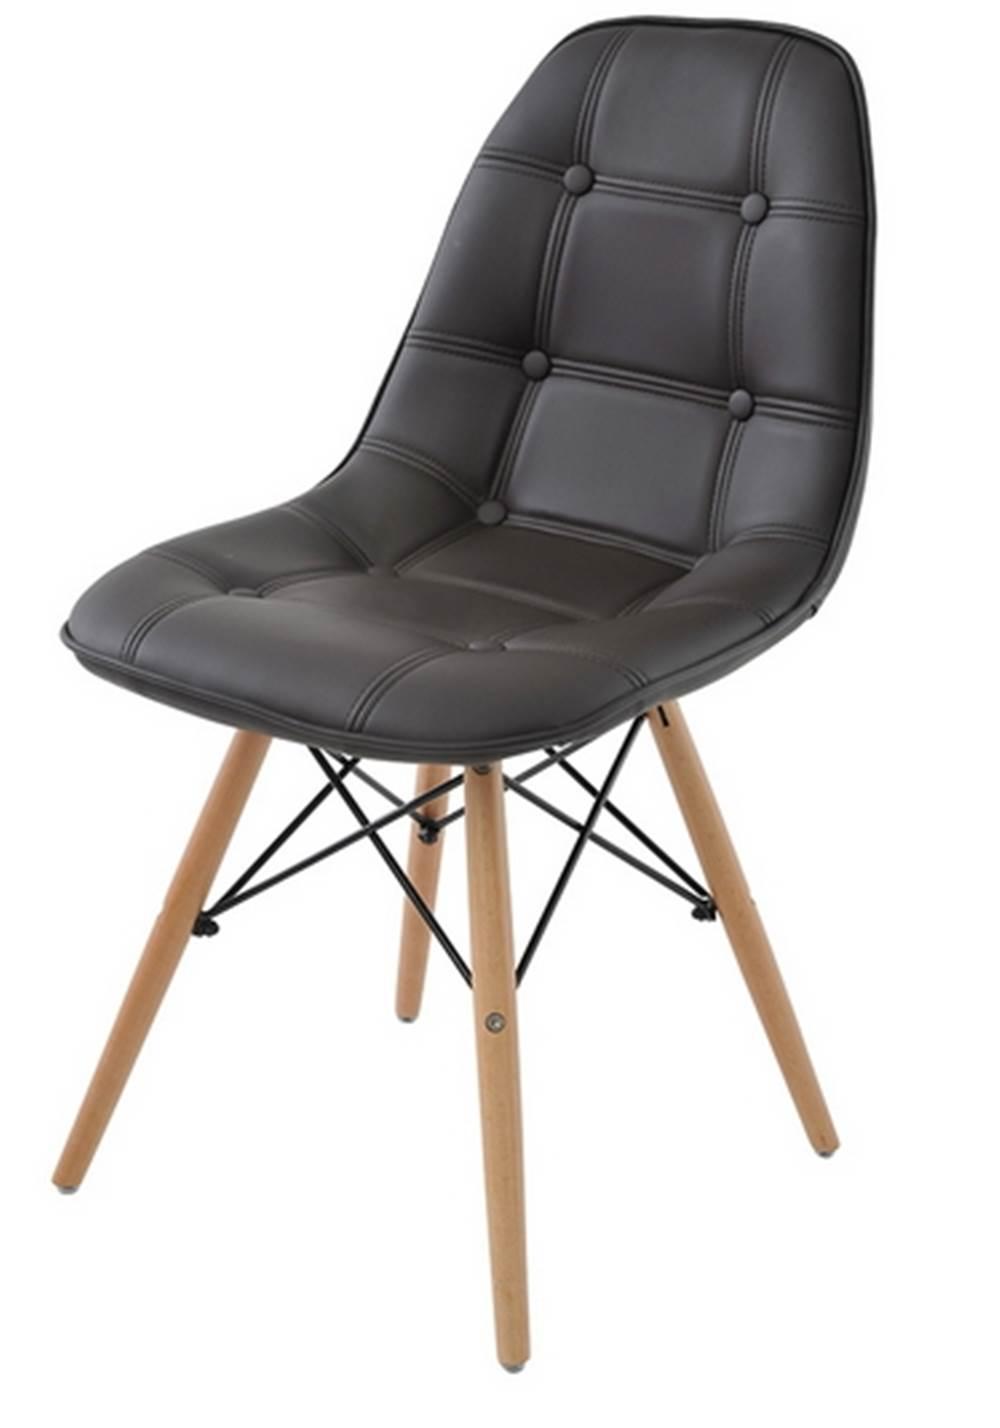 Cadeira Eames Eiffel Botone Marrom Base Madeira - 28350